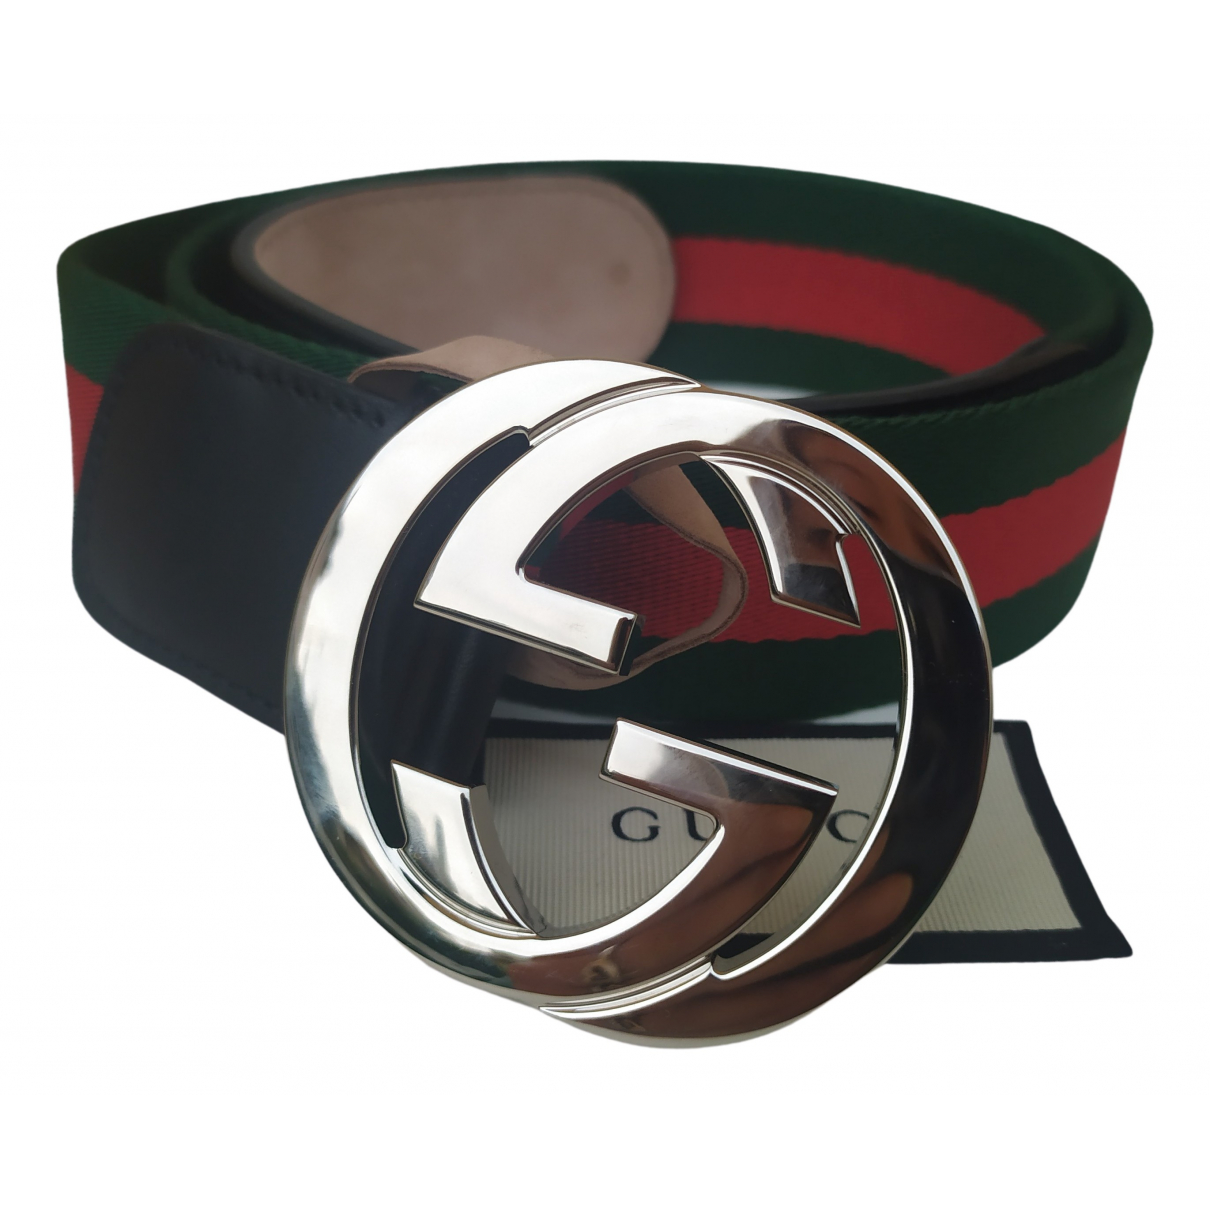 Gucci Interlocking Buckle Cloth belt for Women 85 cm